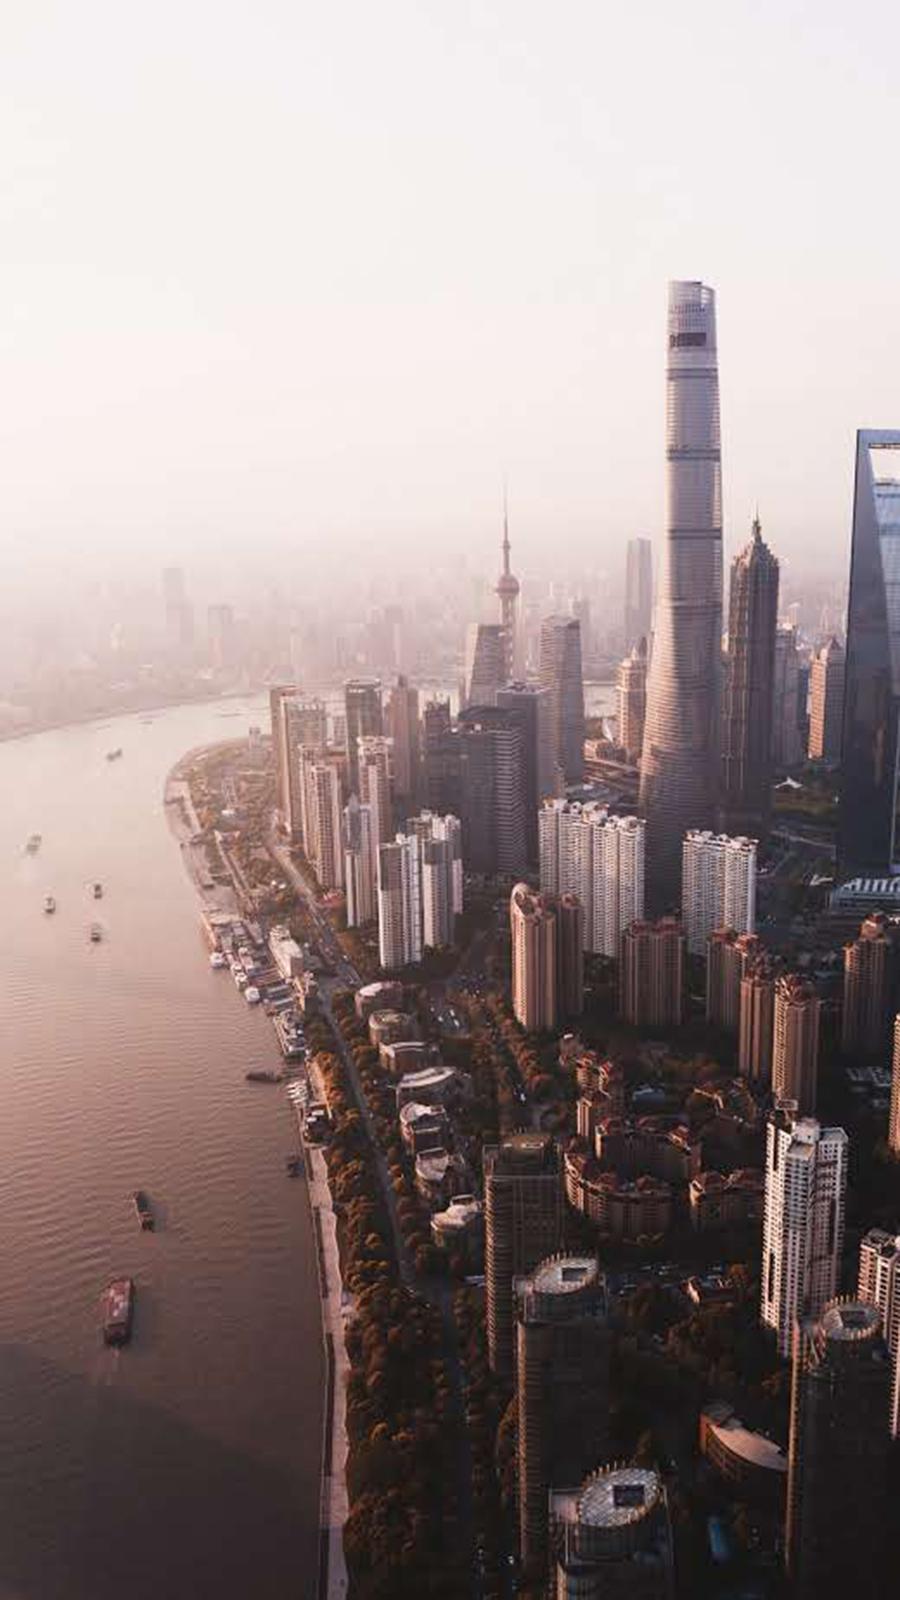 Mega City Wallpapers – Country, City, Mega City Wallpaper Free Download